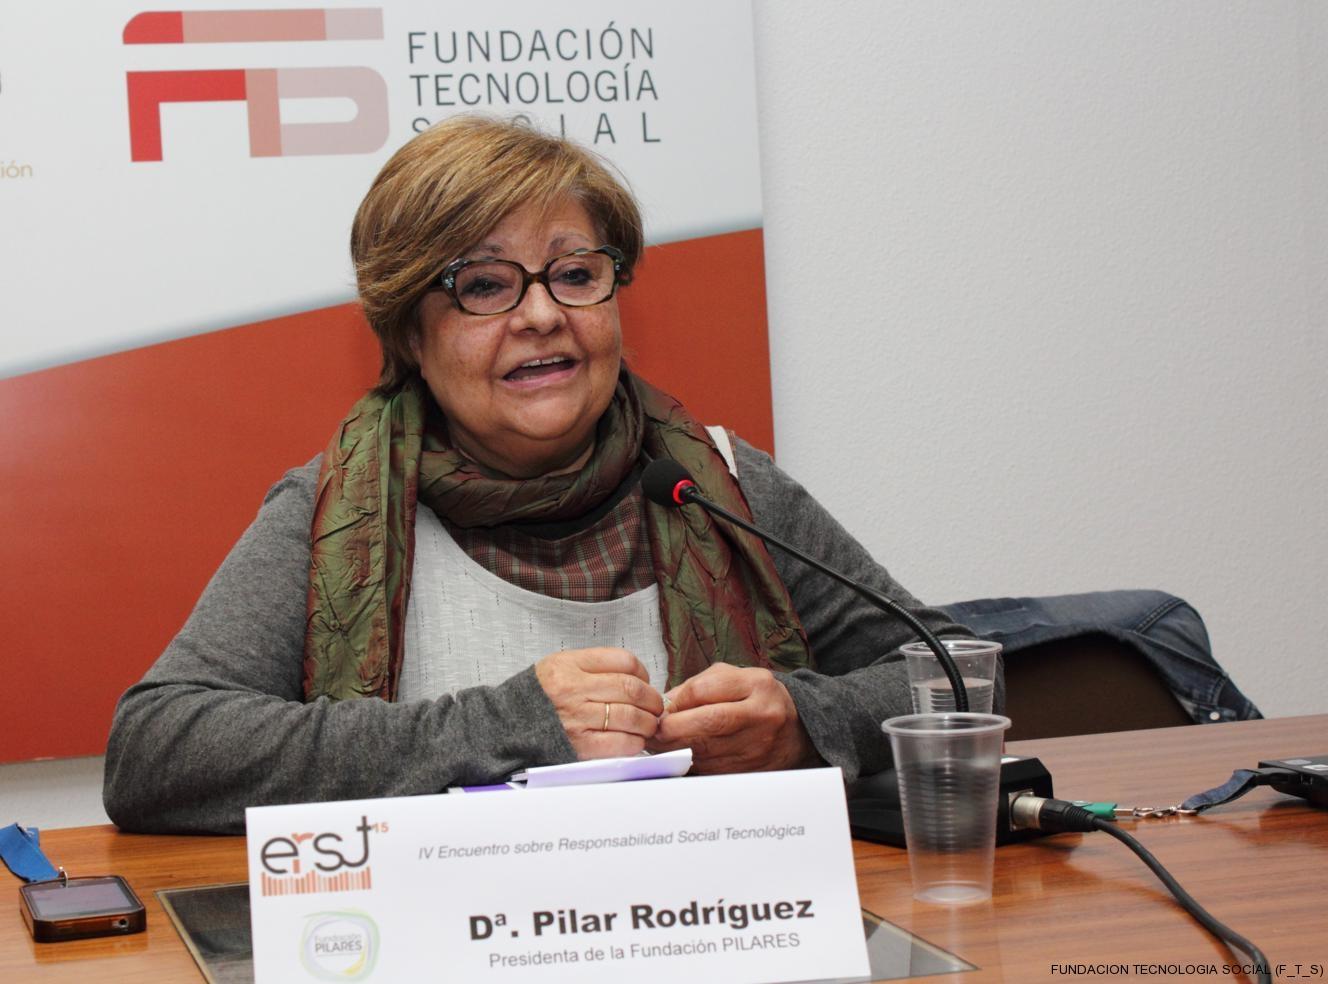 044-Pilar-Rodriguez.JPG